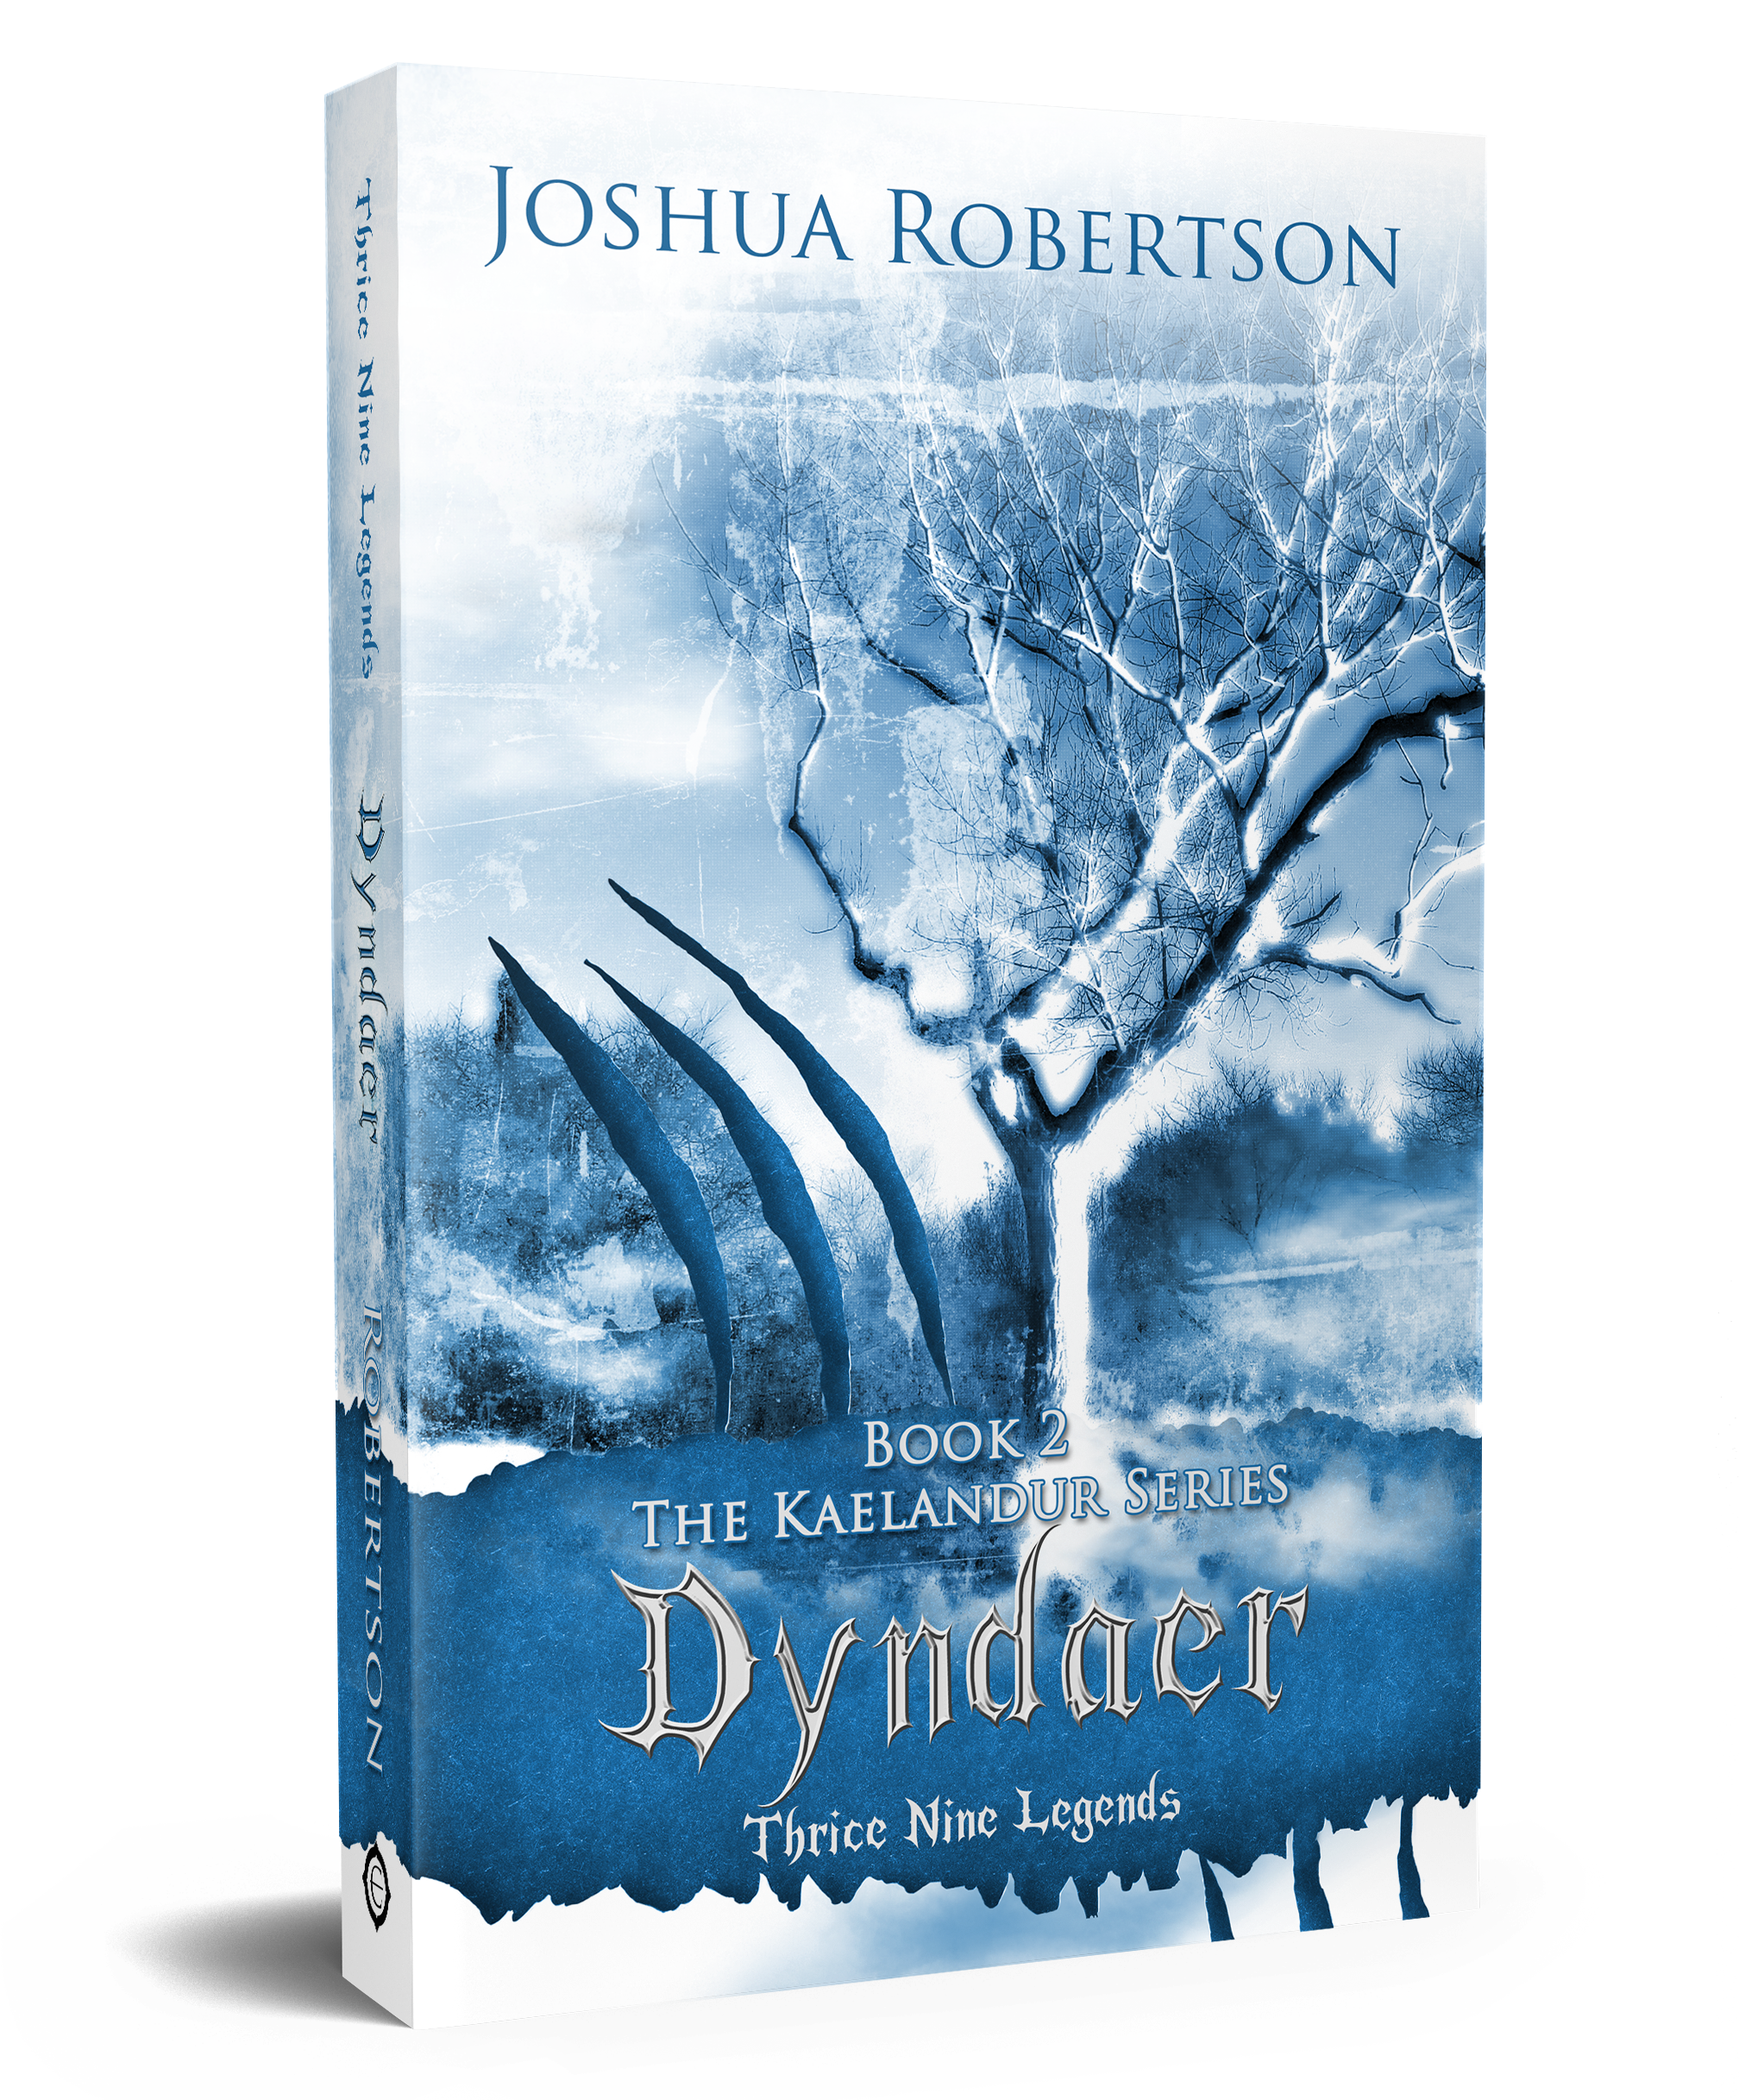 Dyndaer - Paperback 00002